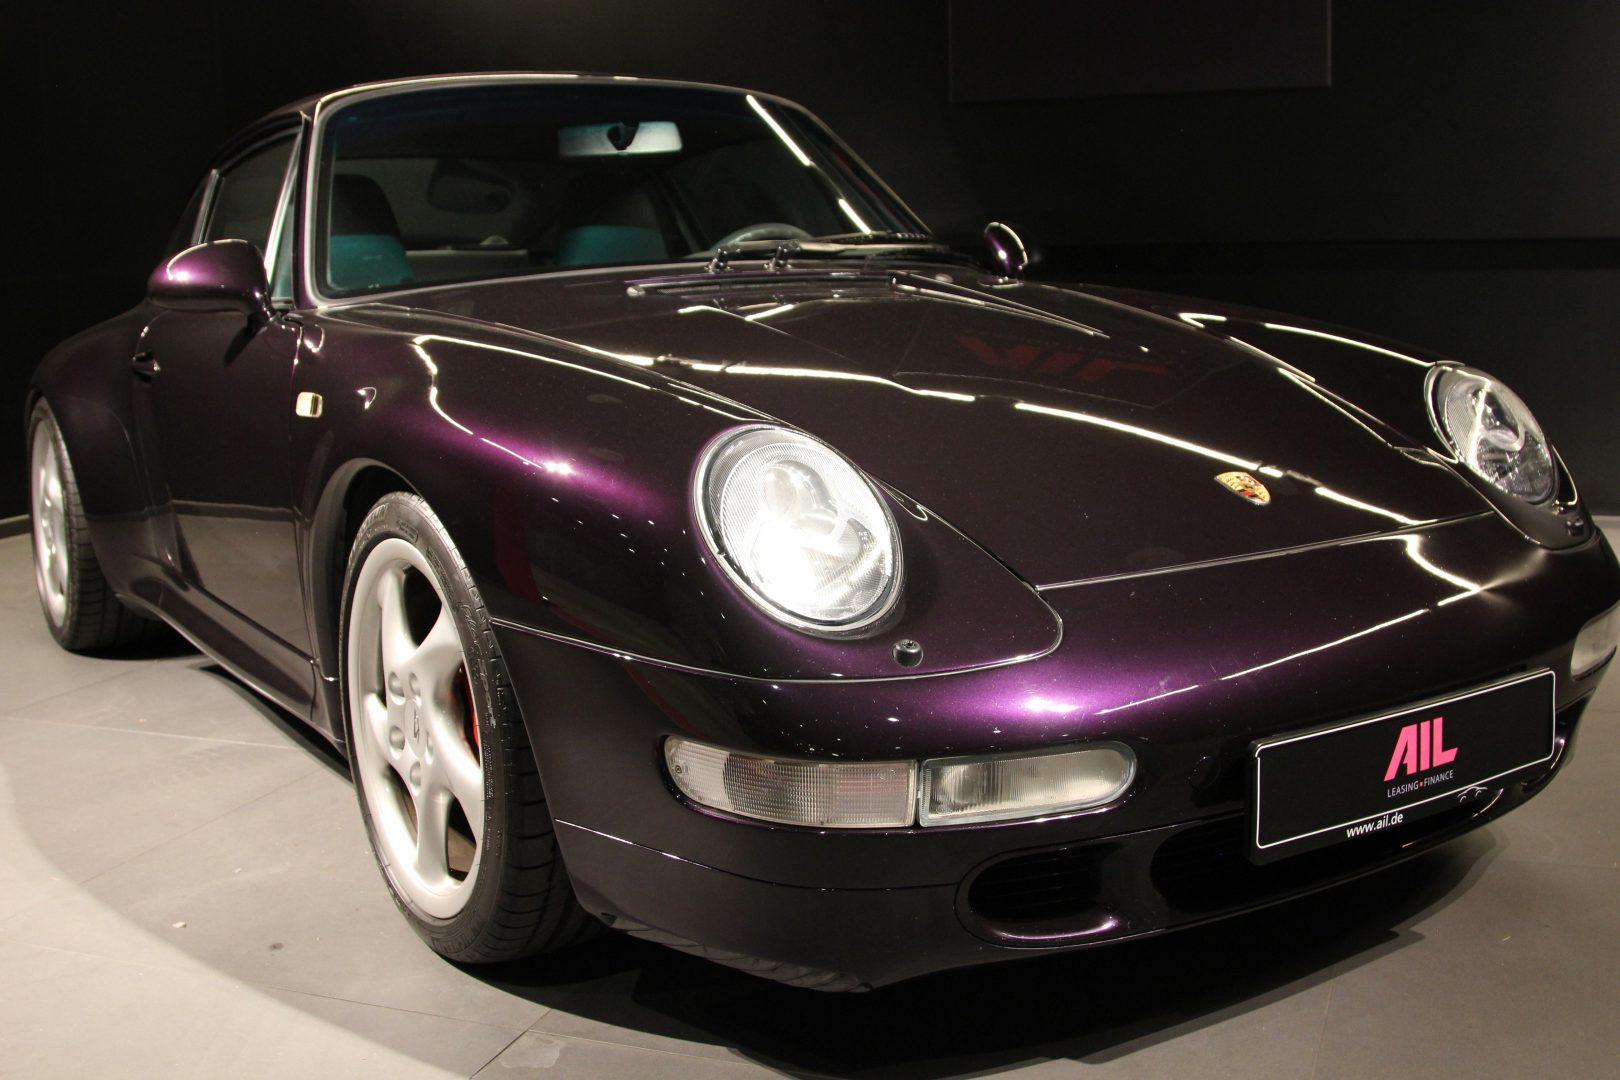 AIL Porsche 911 993 Carrera 4S 11